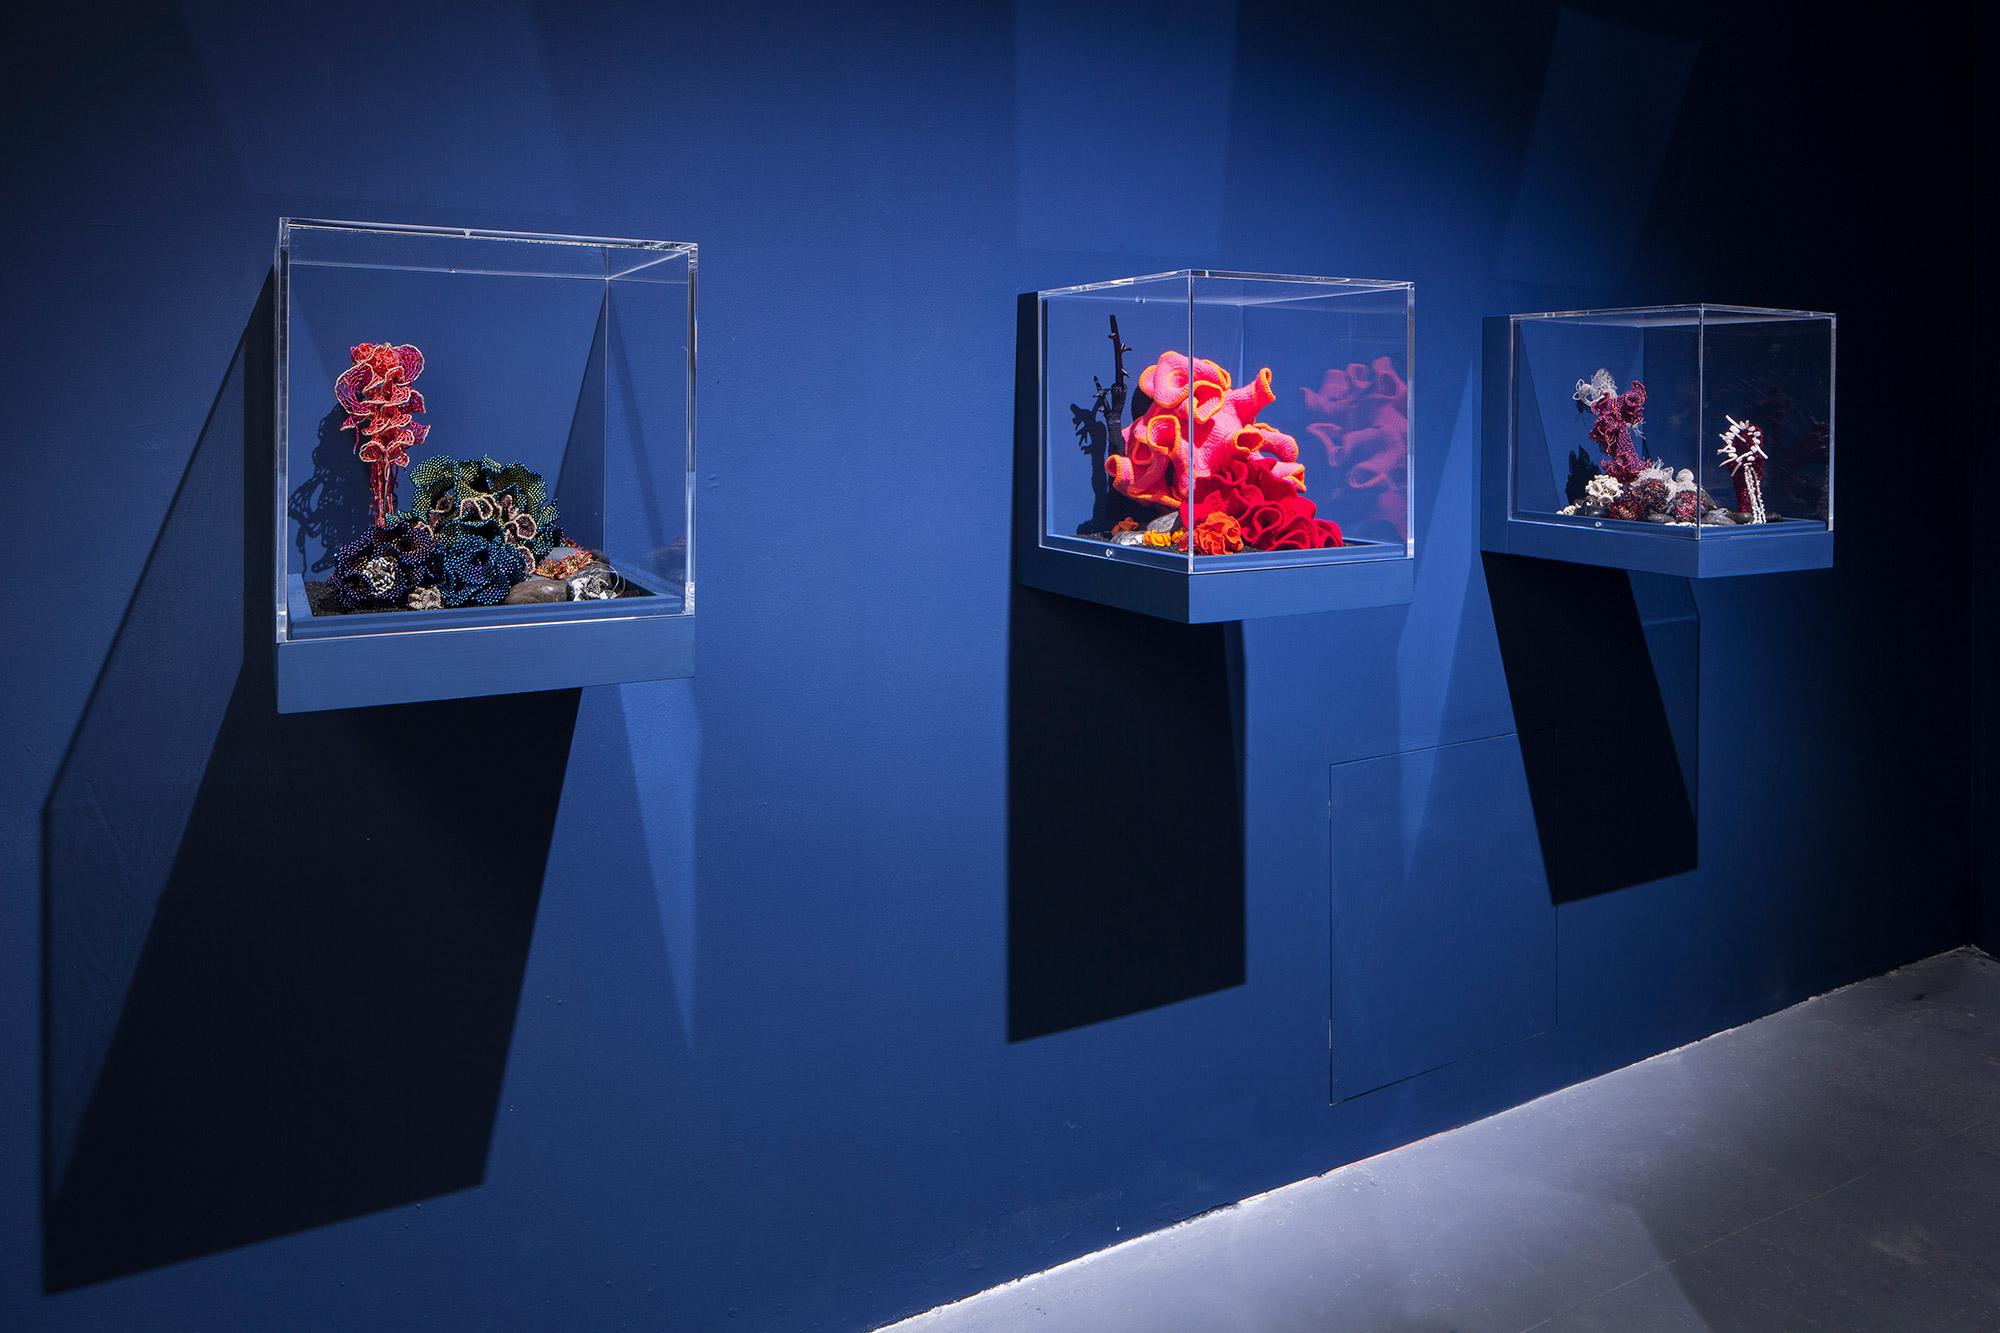 Three reef sculptures